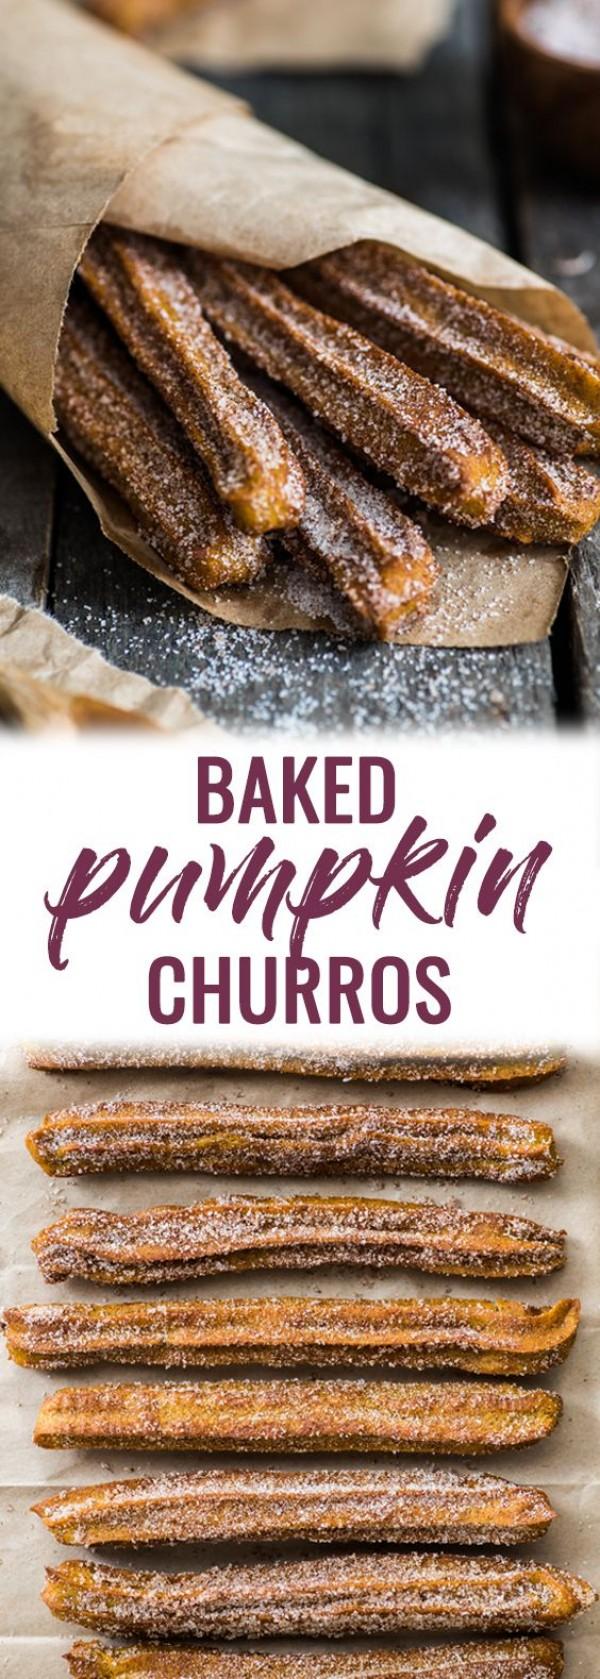 Get the recipe Baked Pumpkin Churros @recipes_to_go